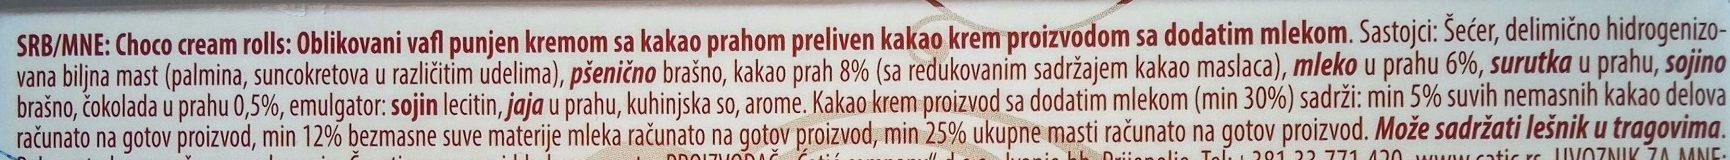 Choko cream rolls - Inhaltsstoffe - sr